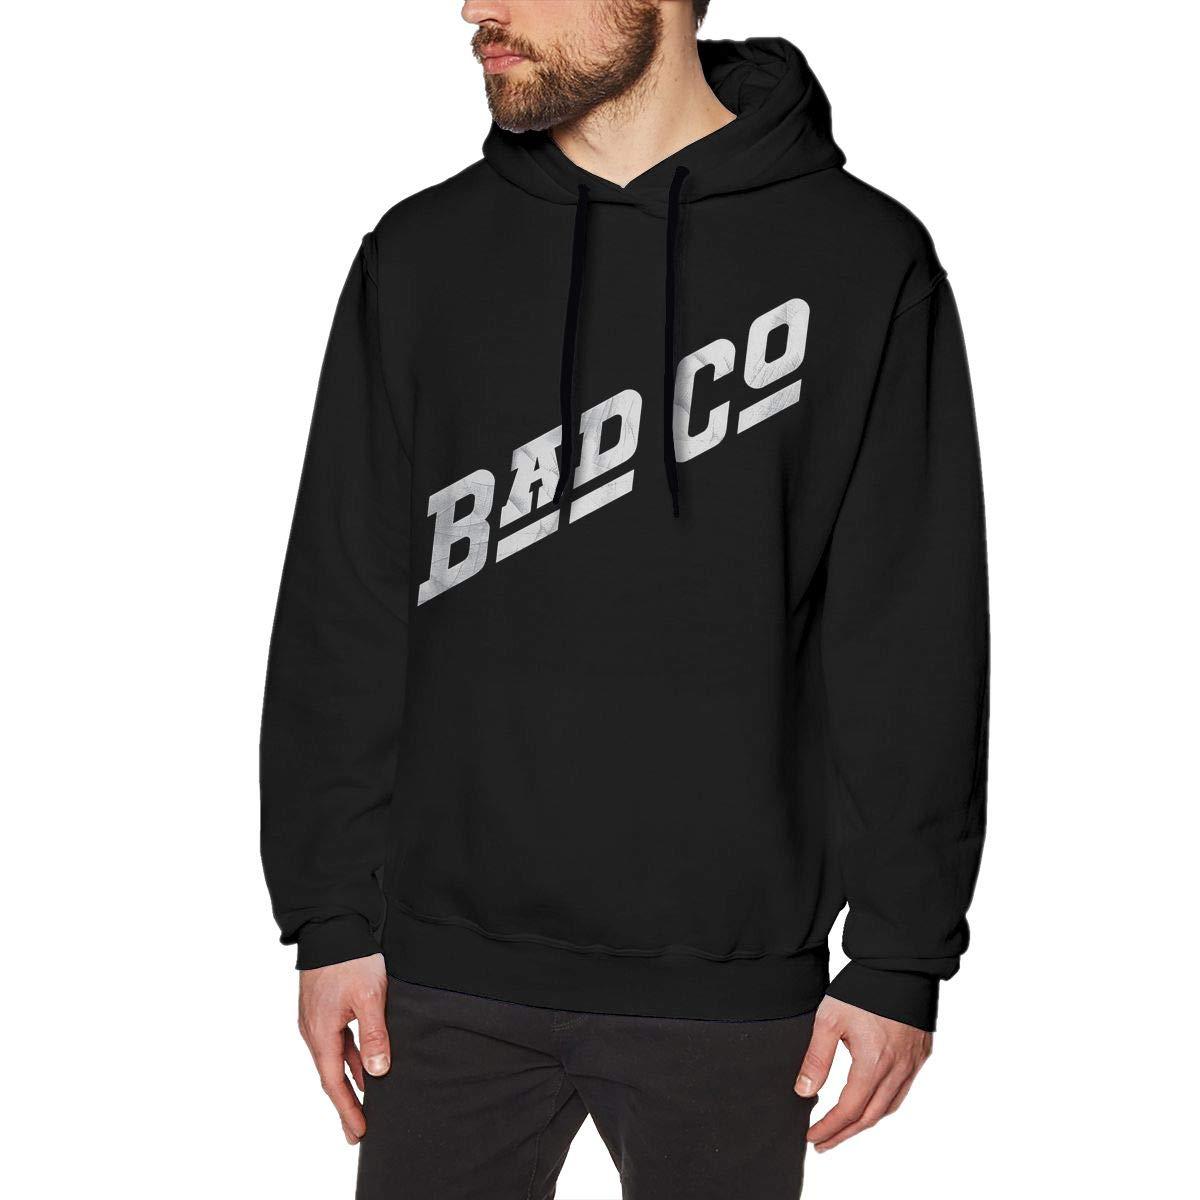 Qnchkopd Bad Company Fashion 8262 Shirts